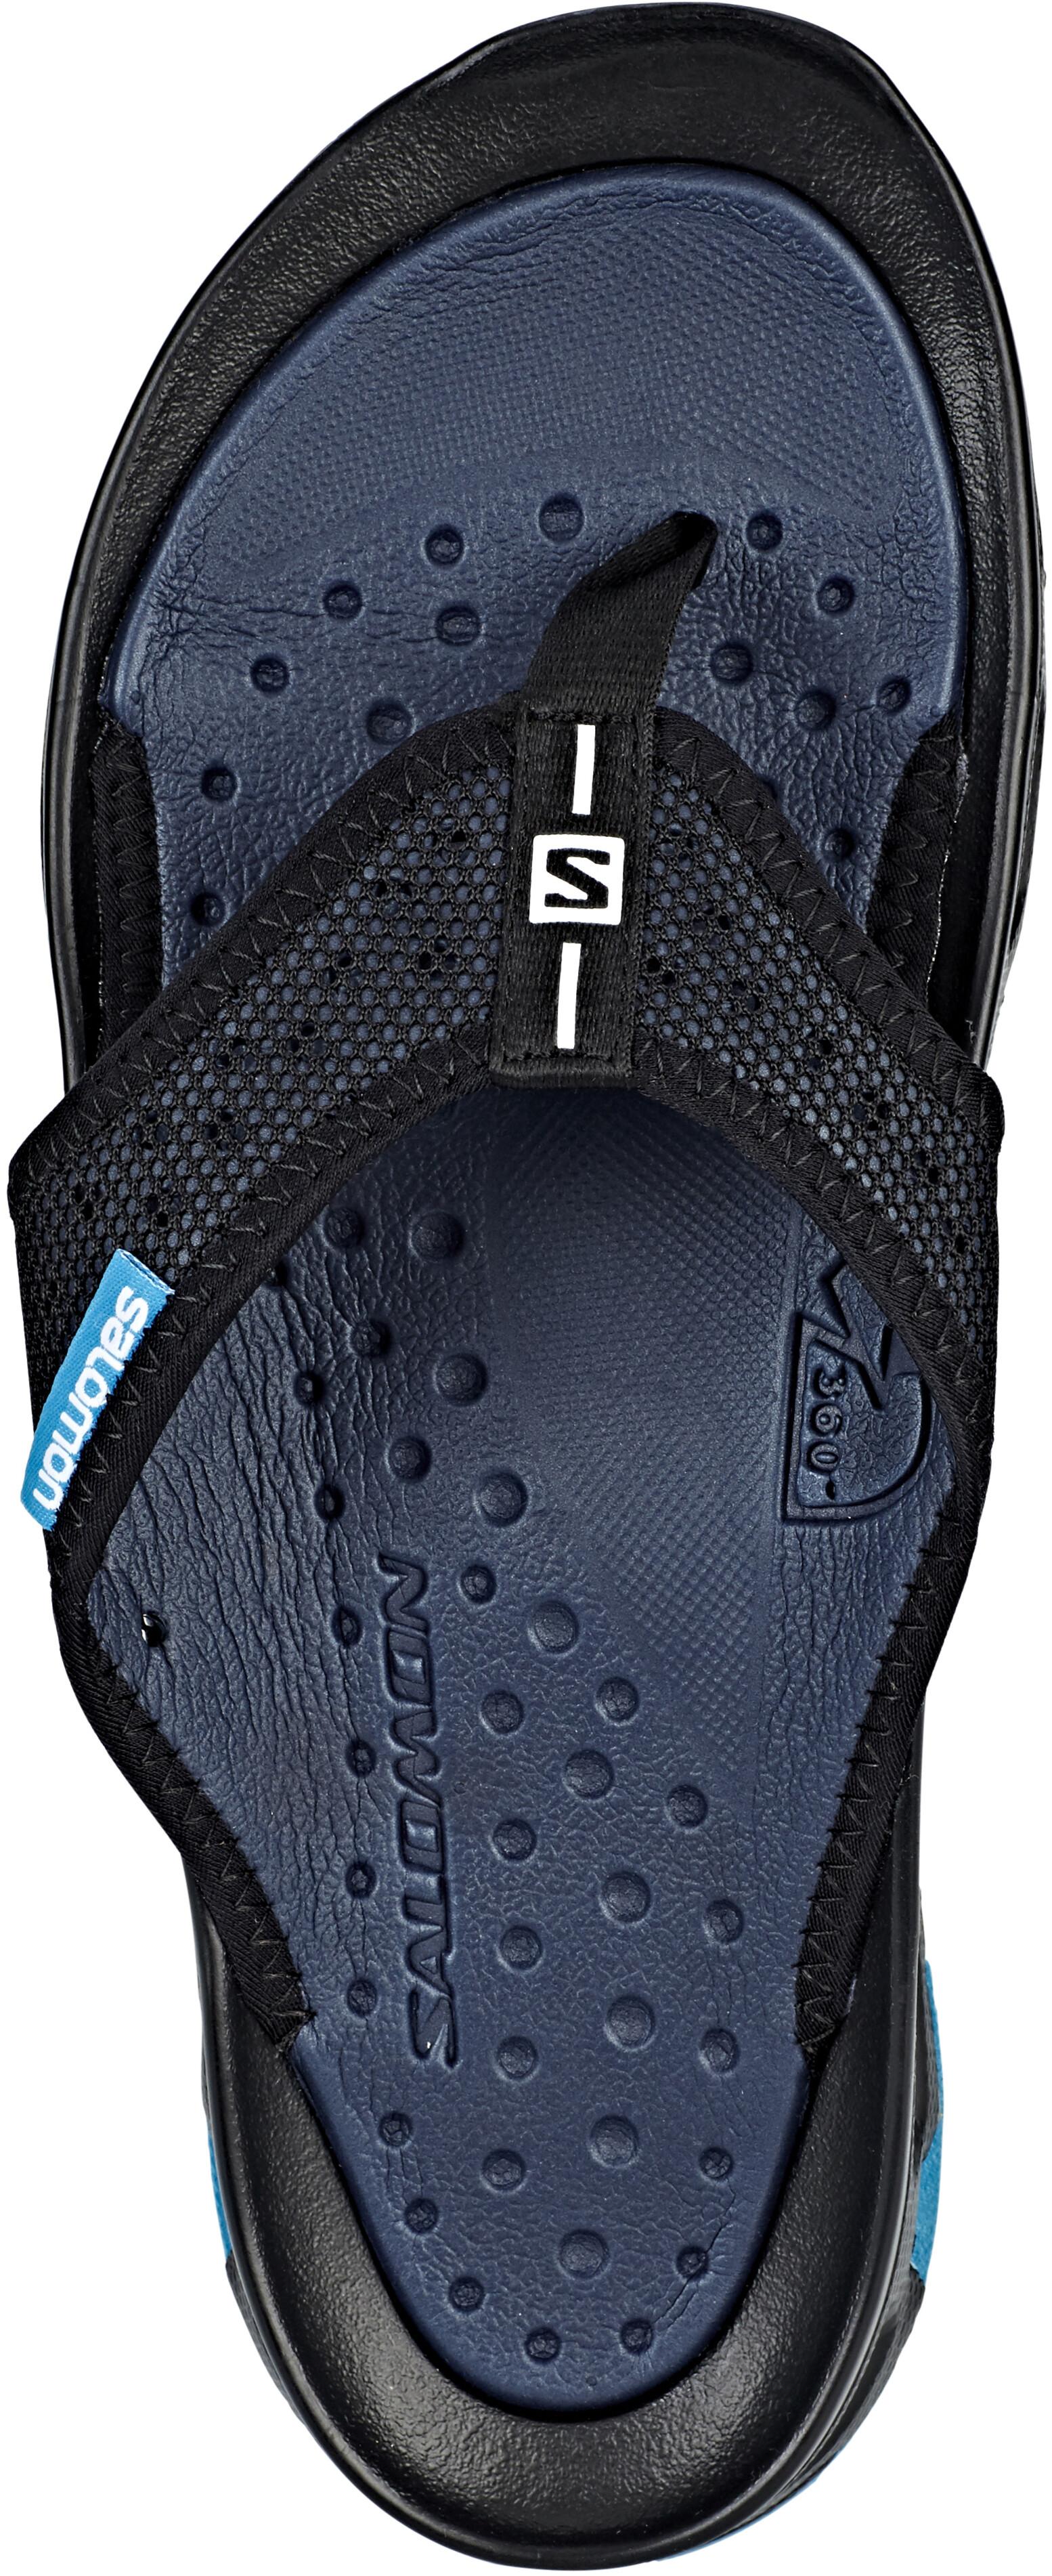 682ec9639f5a88 Salomon RX Break Slippers Men black at Addnature.co.uk